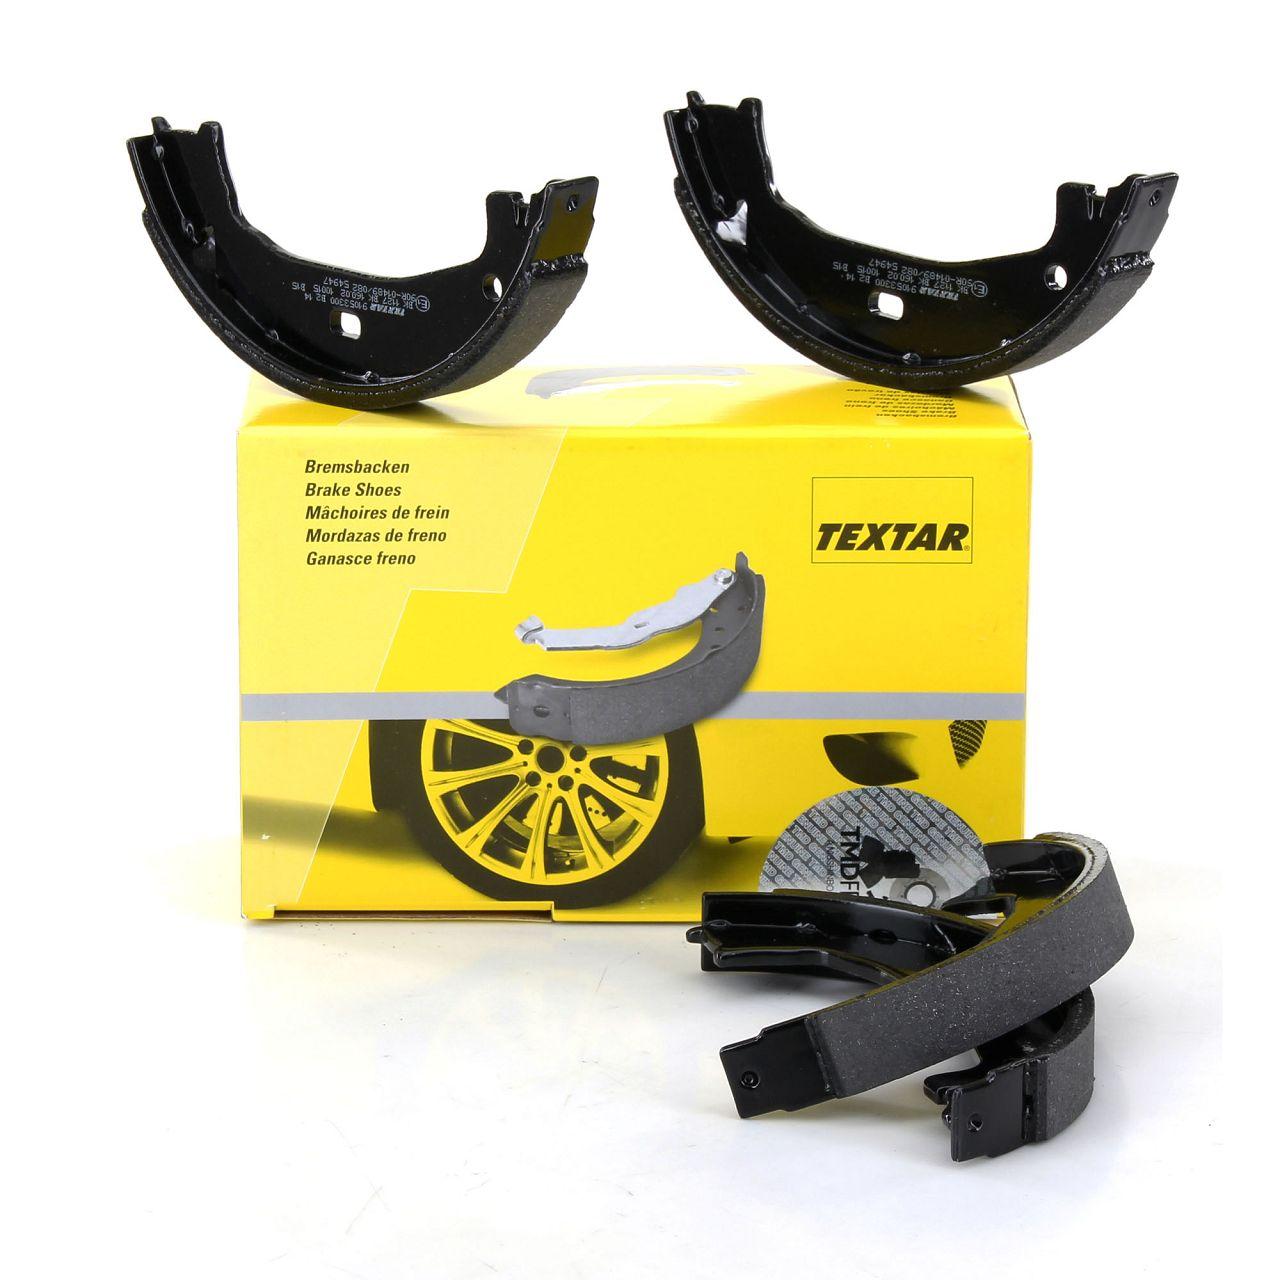 TEXTAR 91053300 Bremsbacken Satz BMW E81 E87 E88 E82 F20-23 E46 E90-93 F30-36 X1 E84 Z4